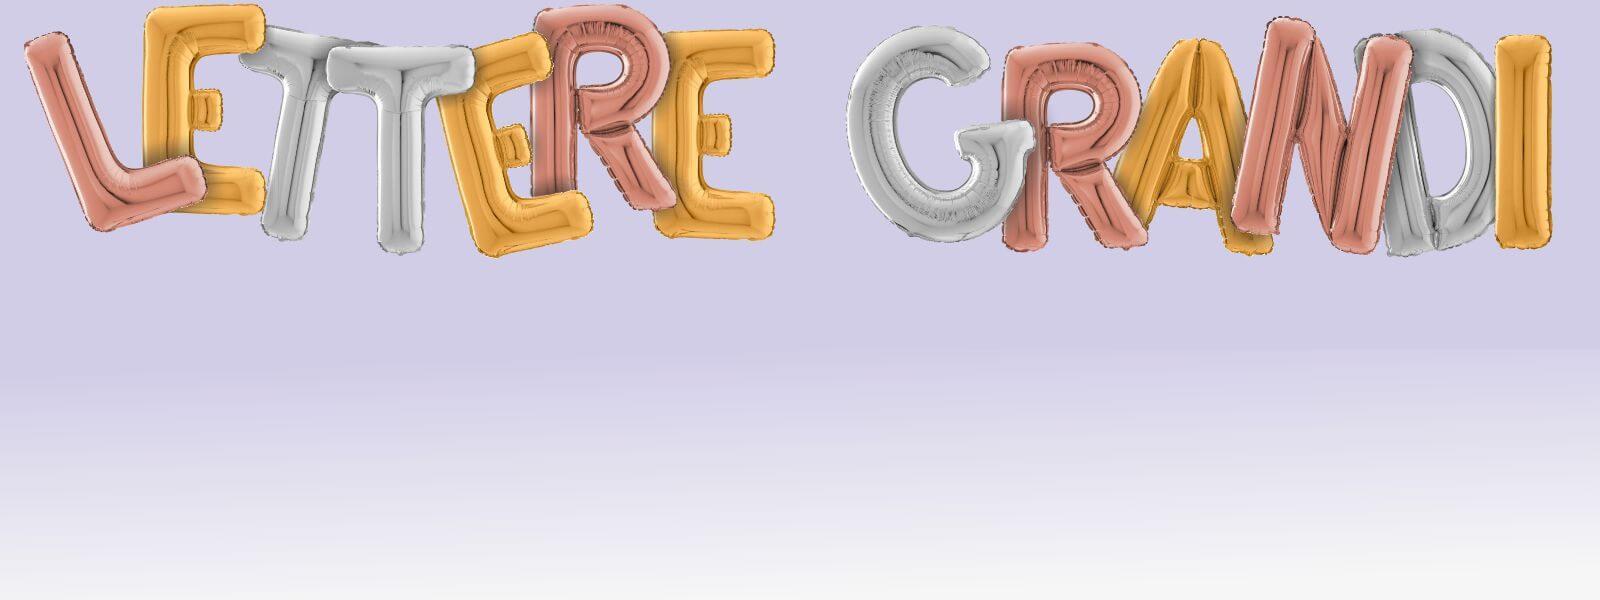 cattex palloncini mylar a lettera da 26 pollici